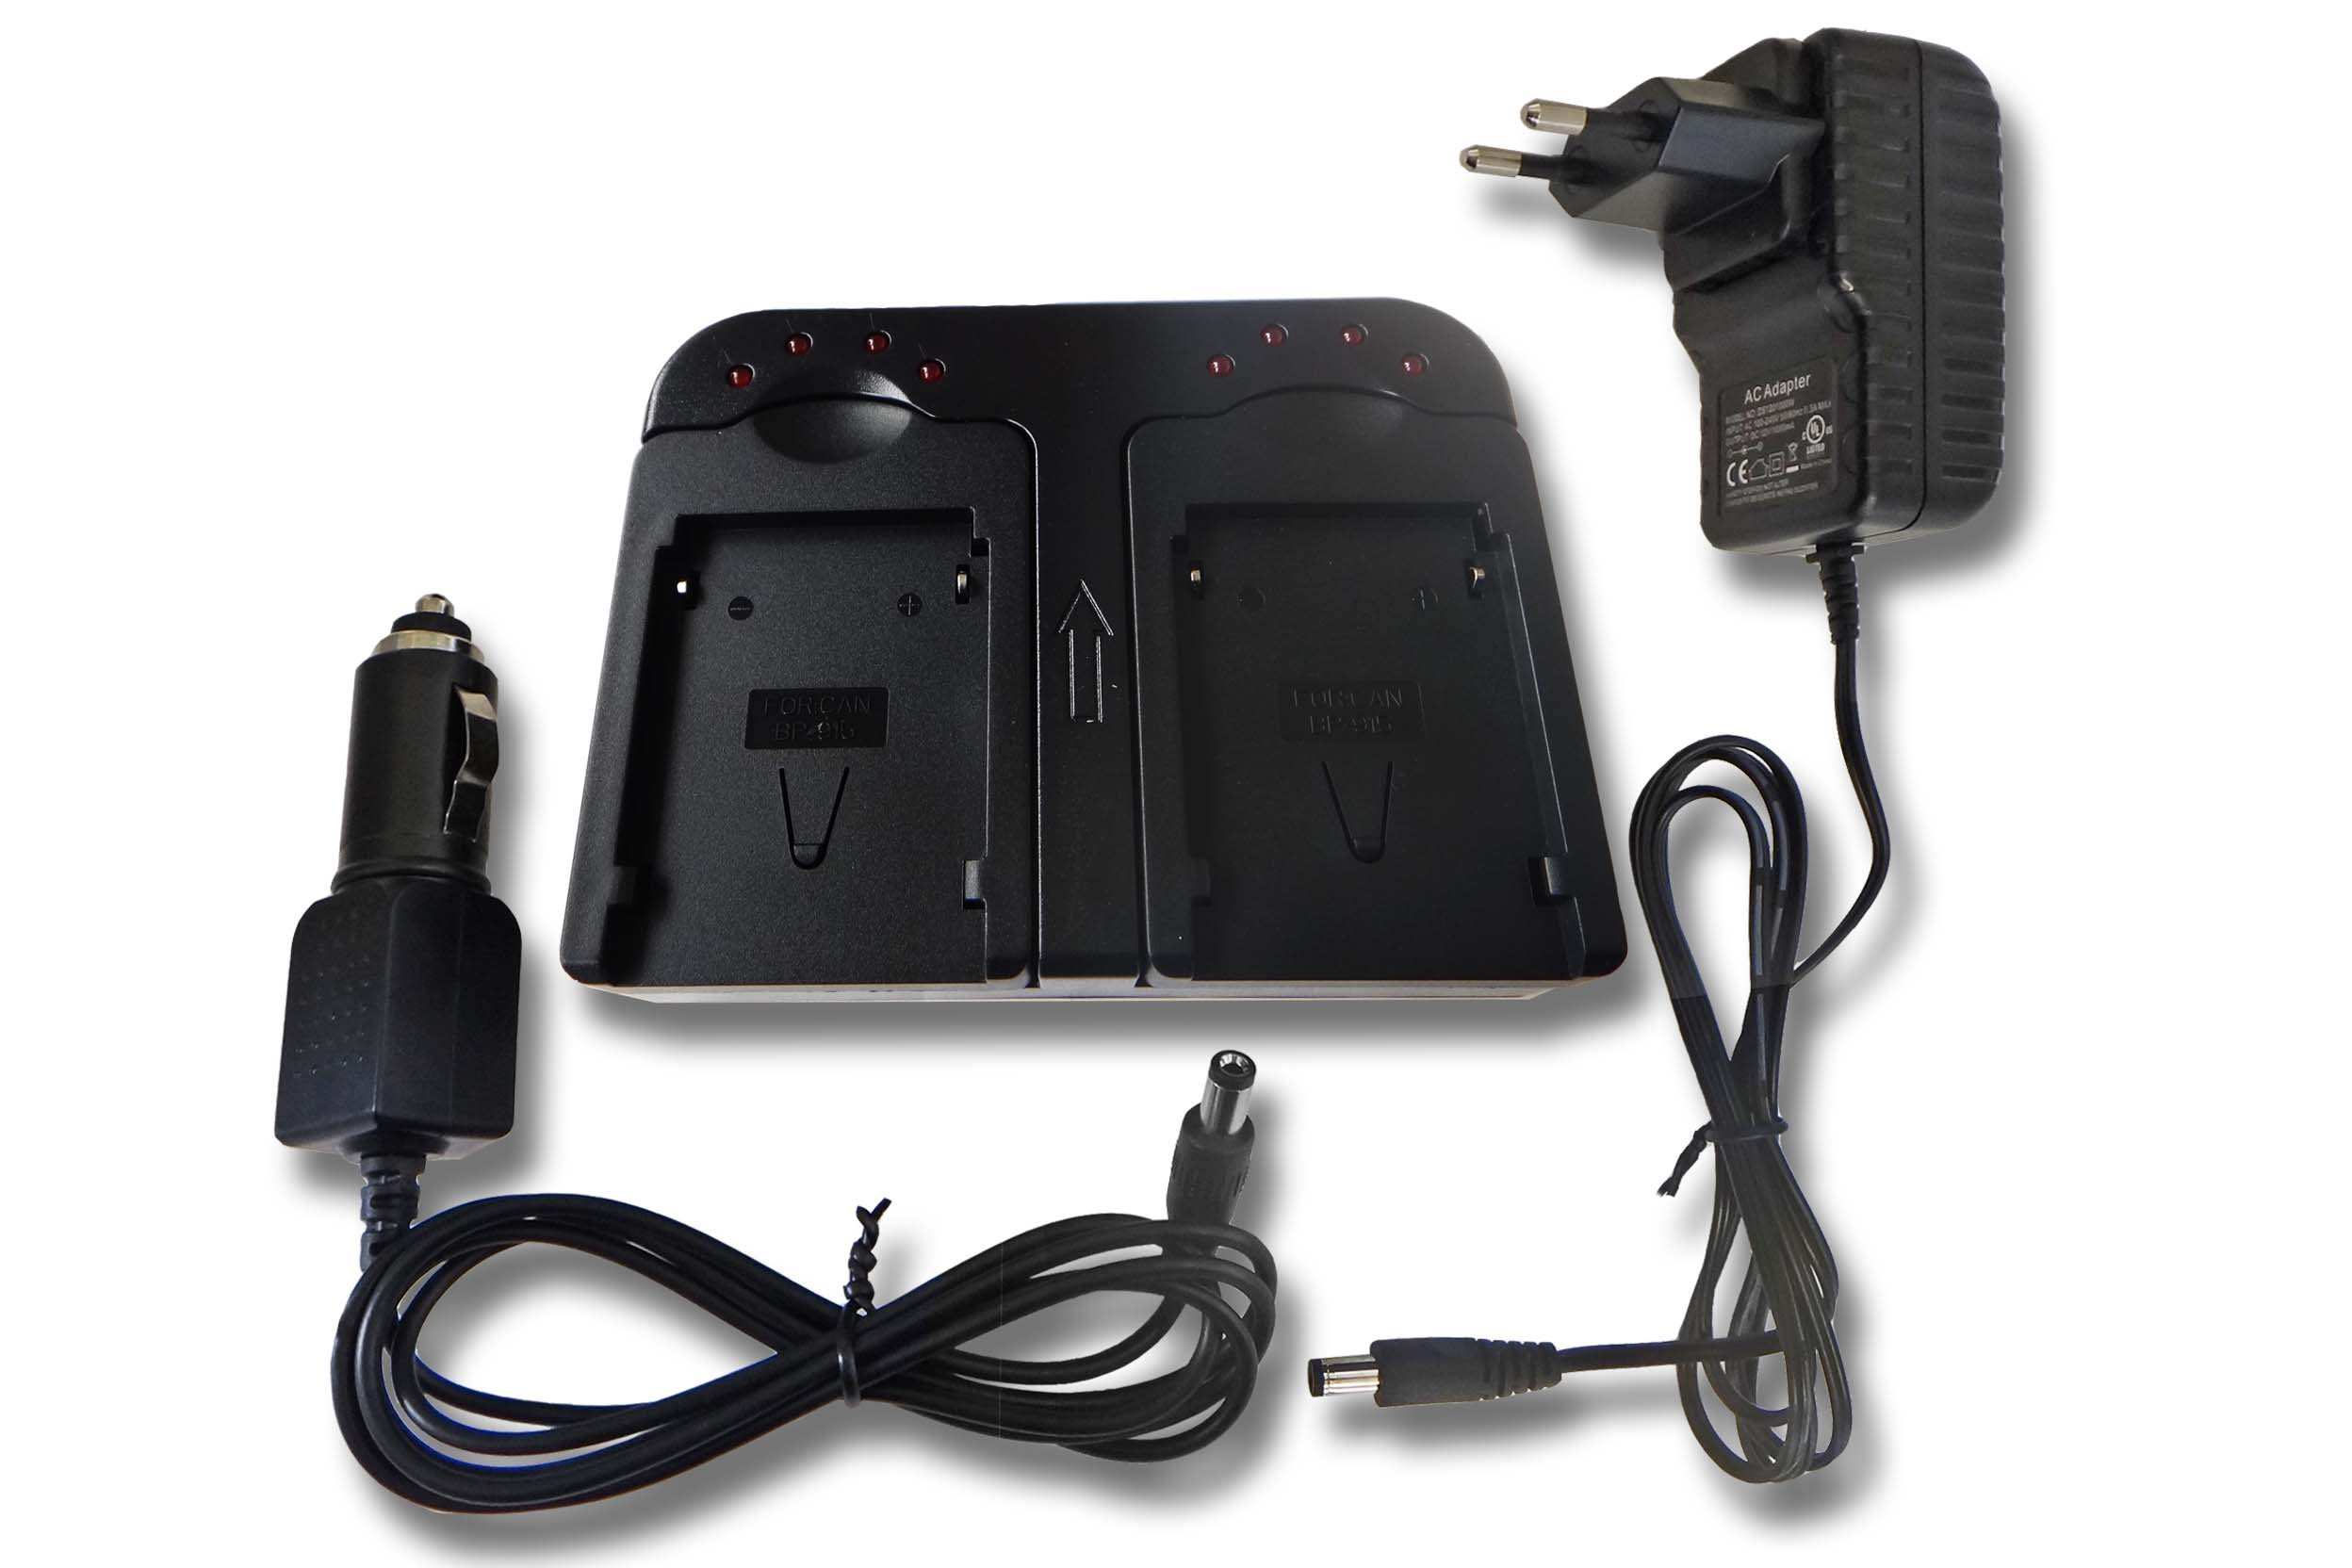 Caricabatterie doppio include Adattatore Automobile per Batteria Canon BP-911, BP-914, BP-915, BP-9